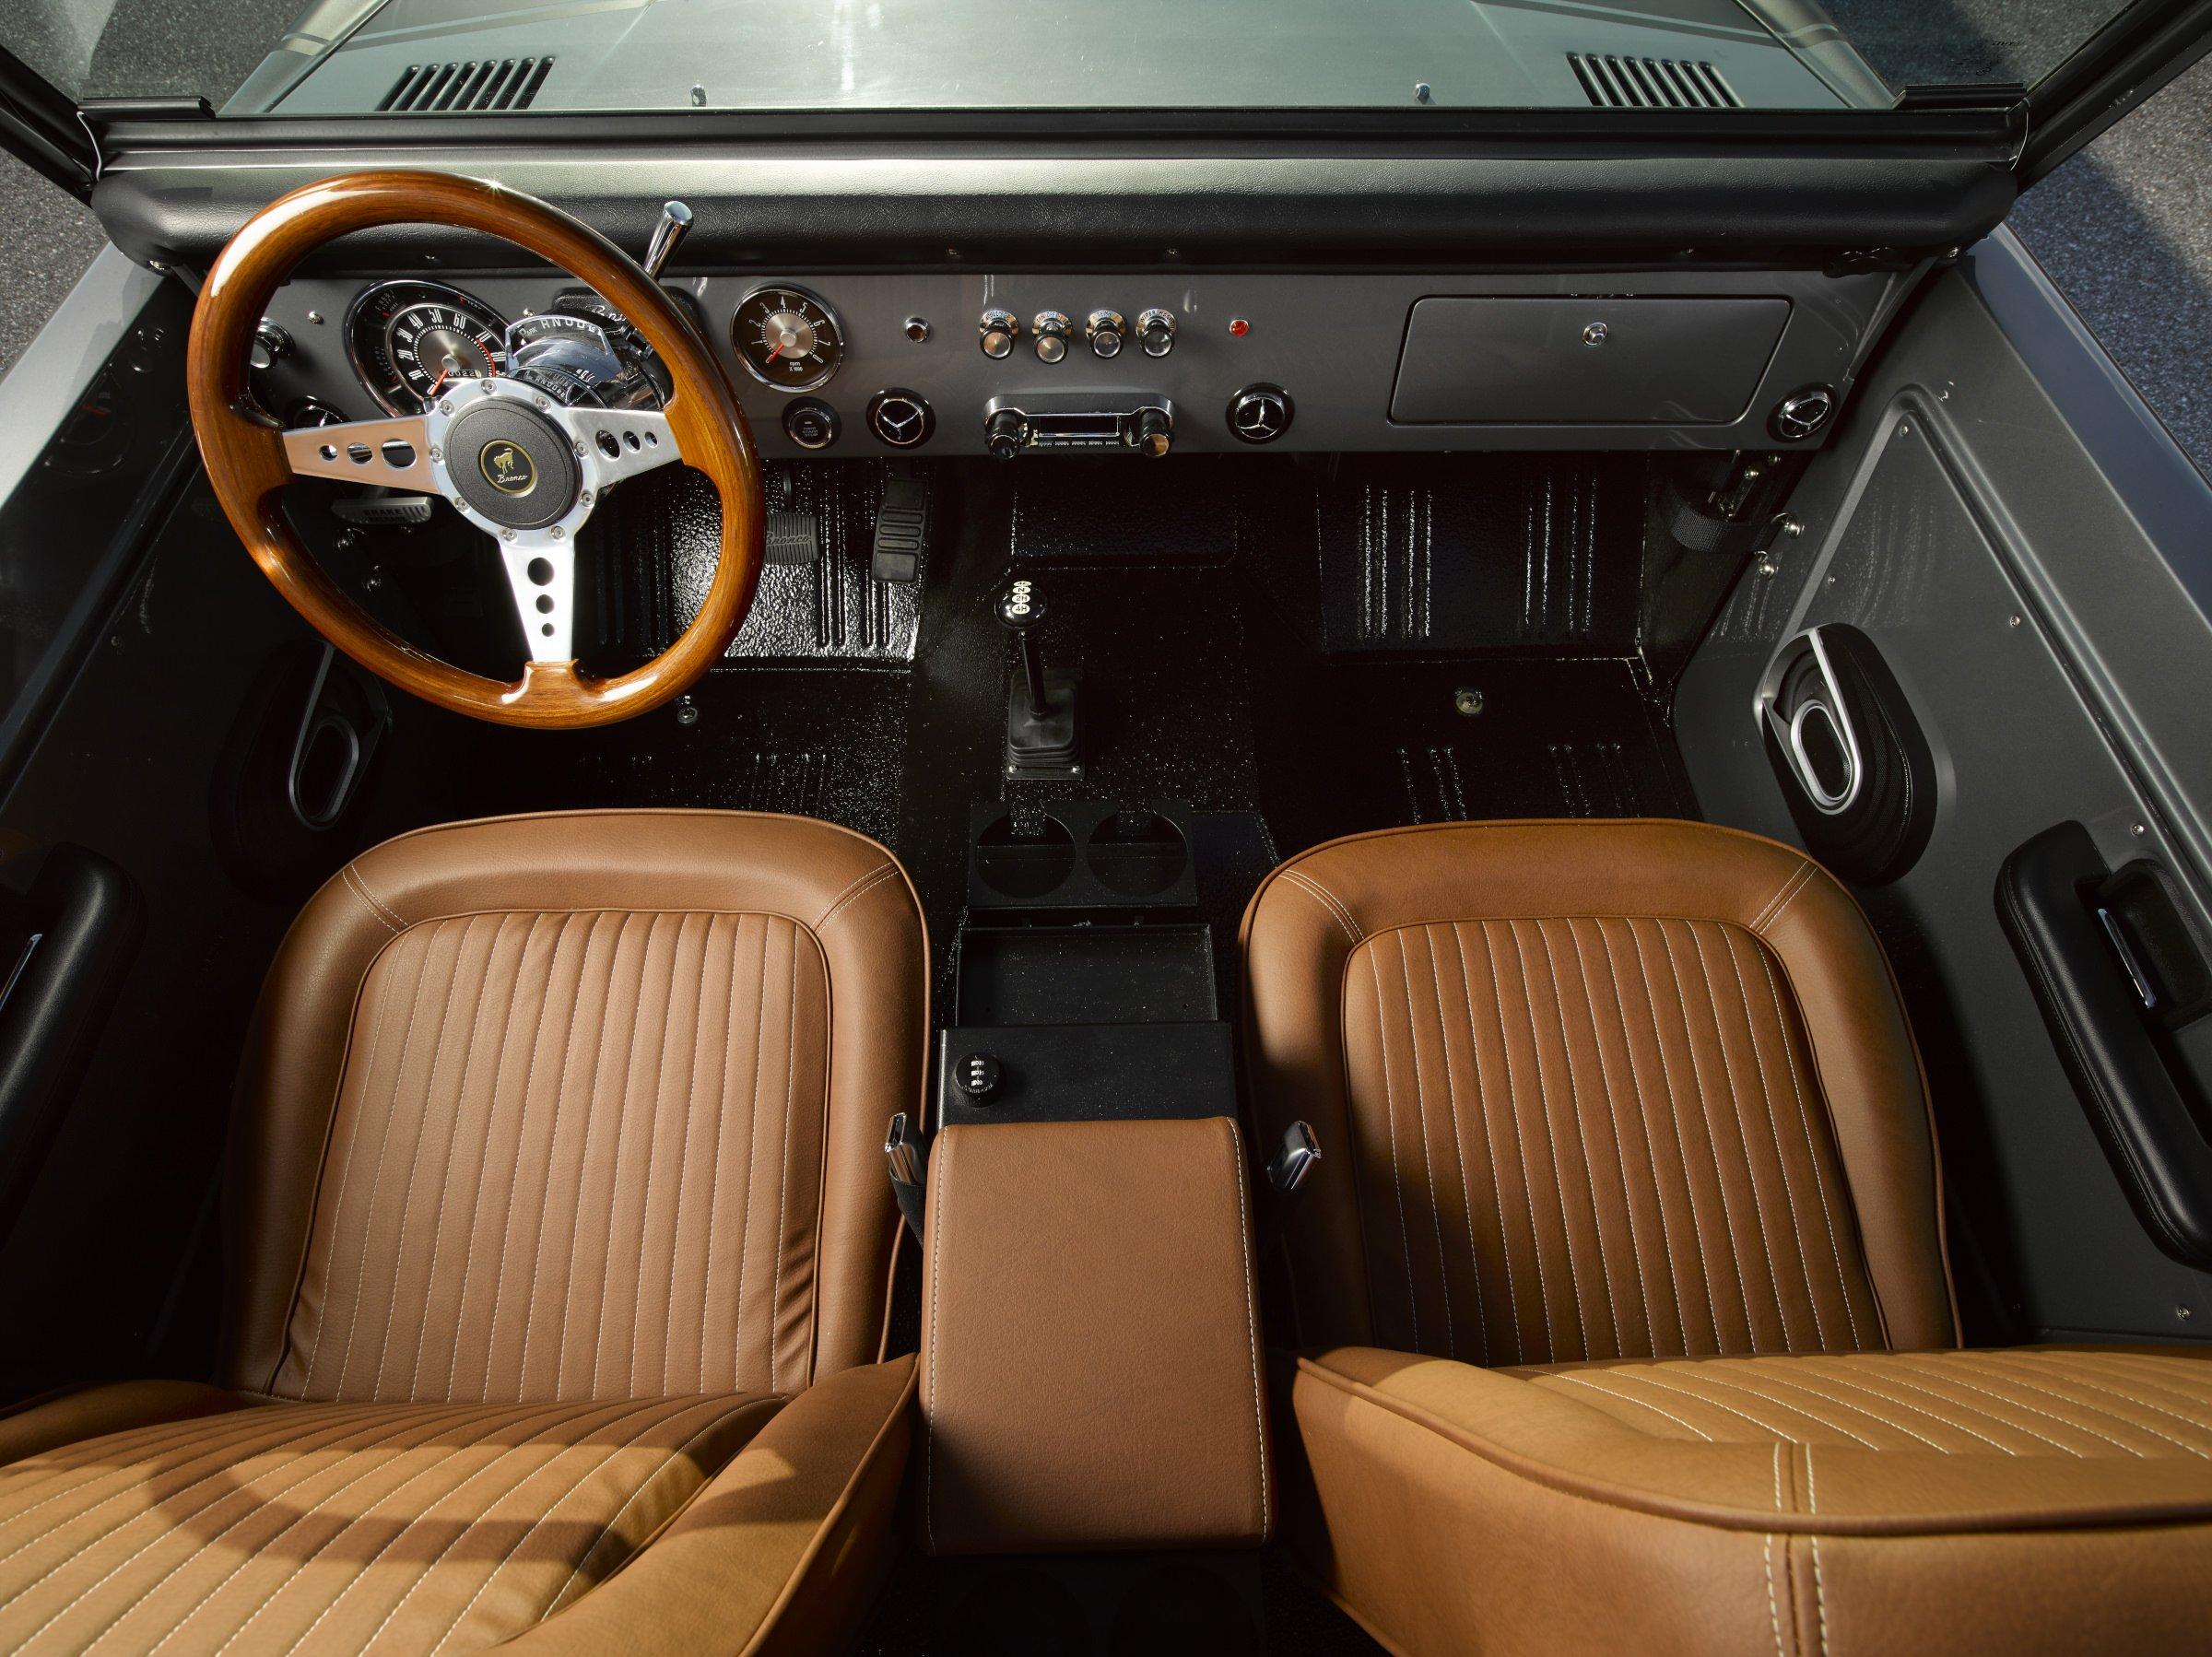 bronco ford restomod interior 1969 seats doors coyote hp engine shown